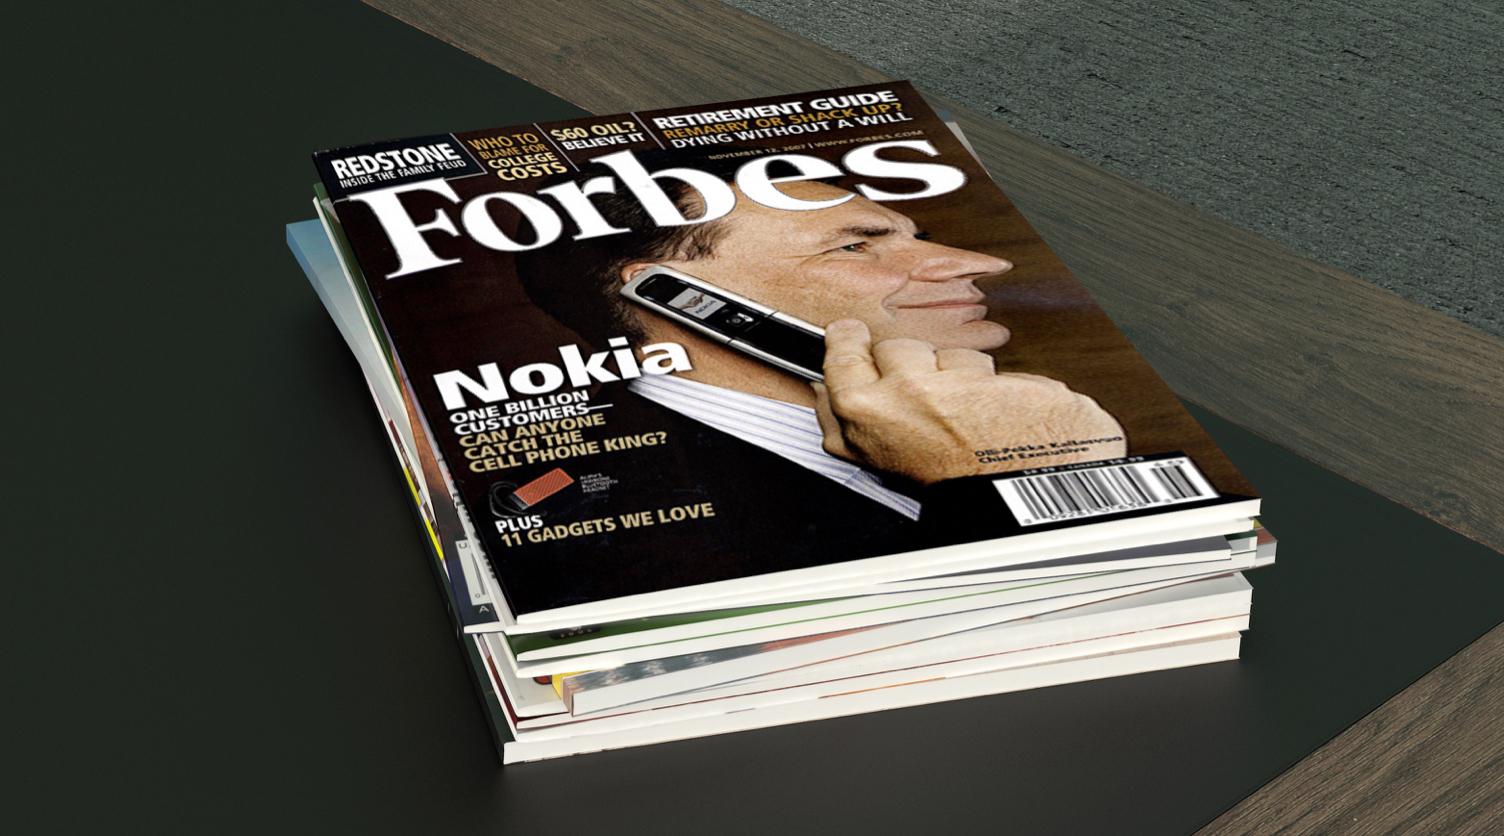 forbes-nokia-digital-transformation-banking-uxda.jpg